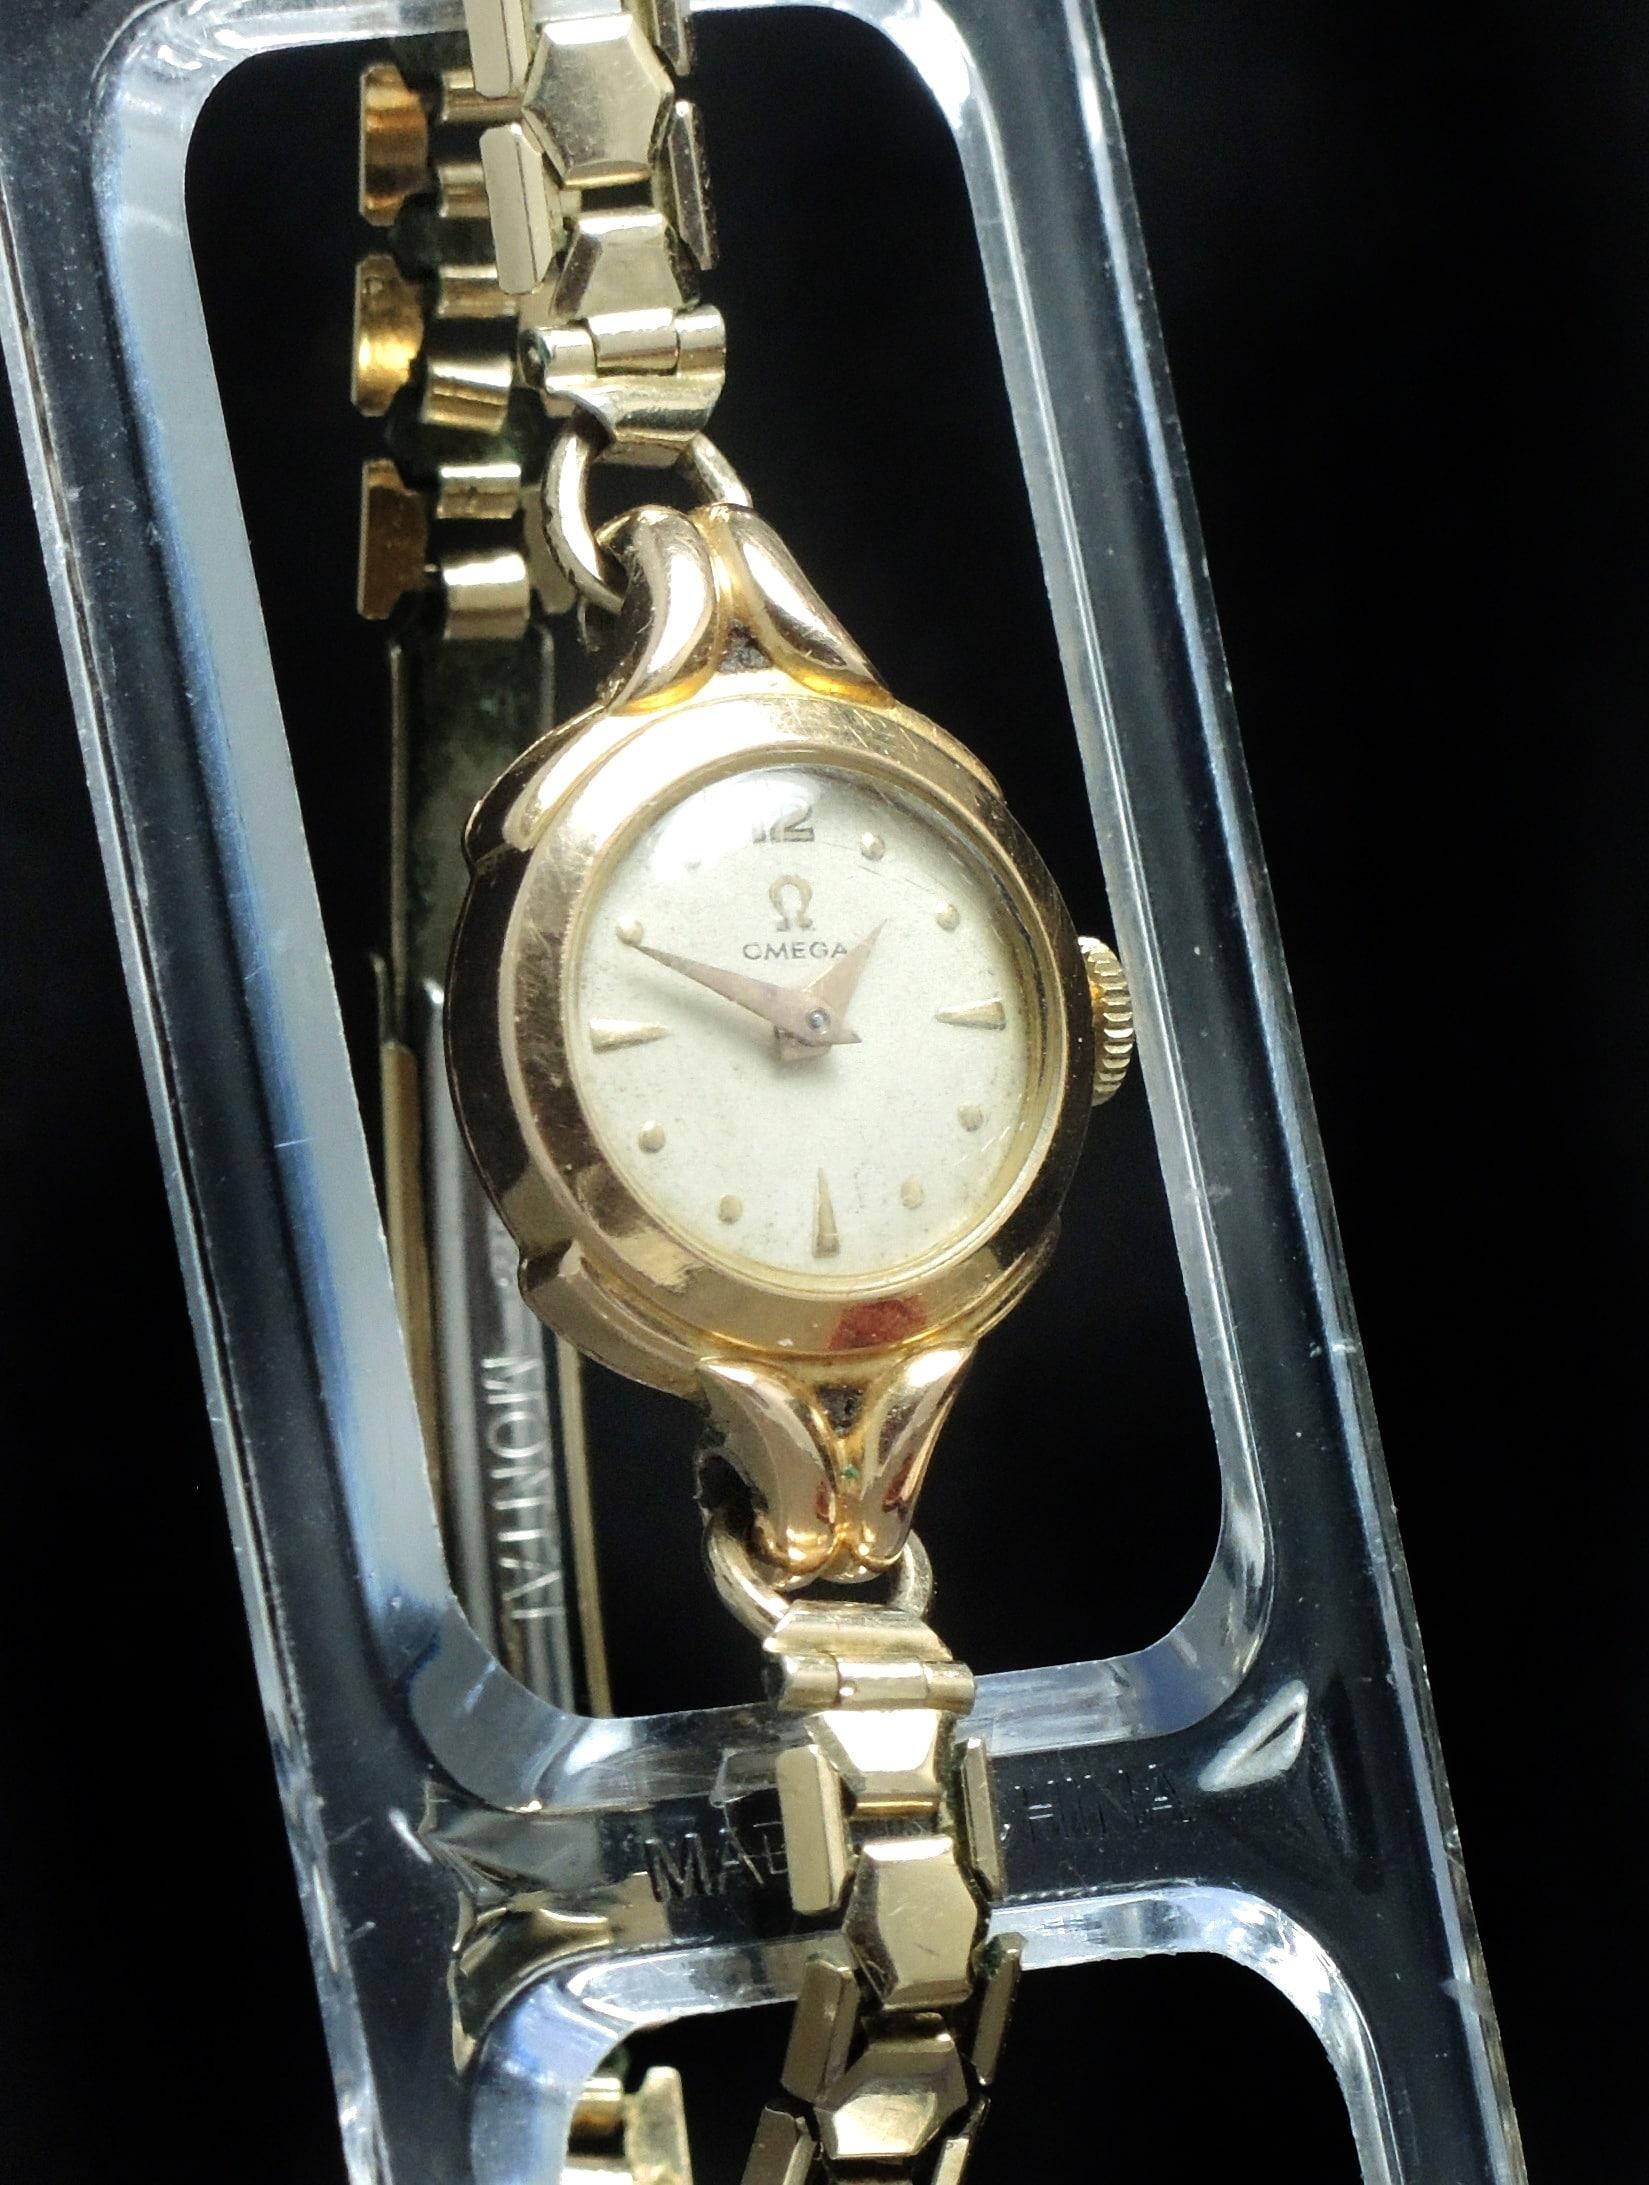 18 Carat Original Omega Damen Uhr In 08nwmn Art Rotgoldvintage Deco HWD2IYE9